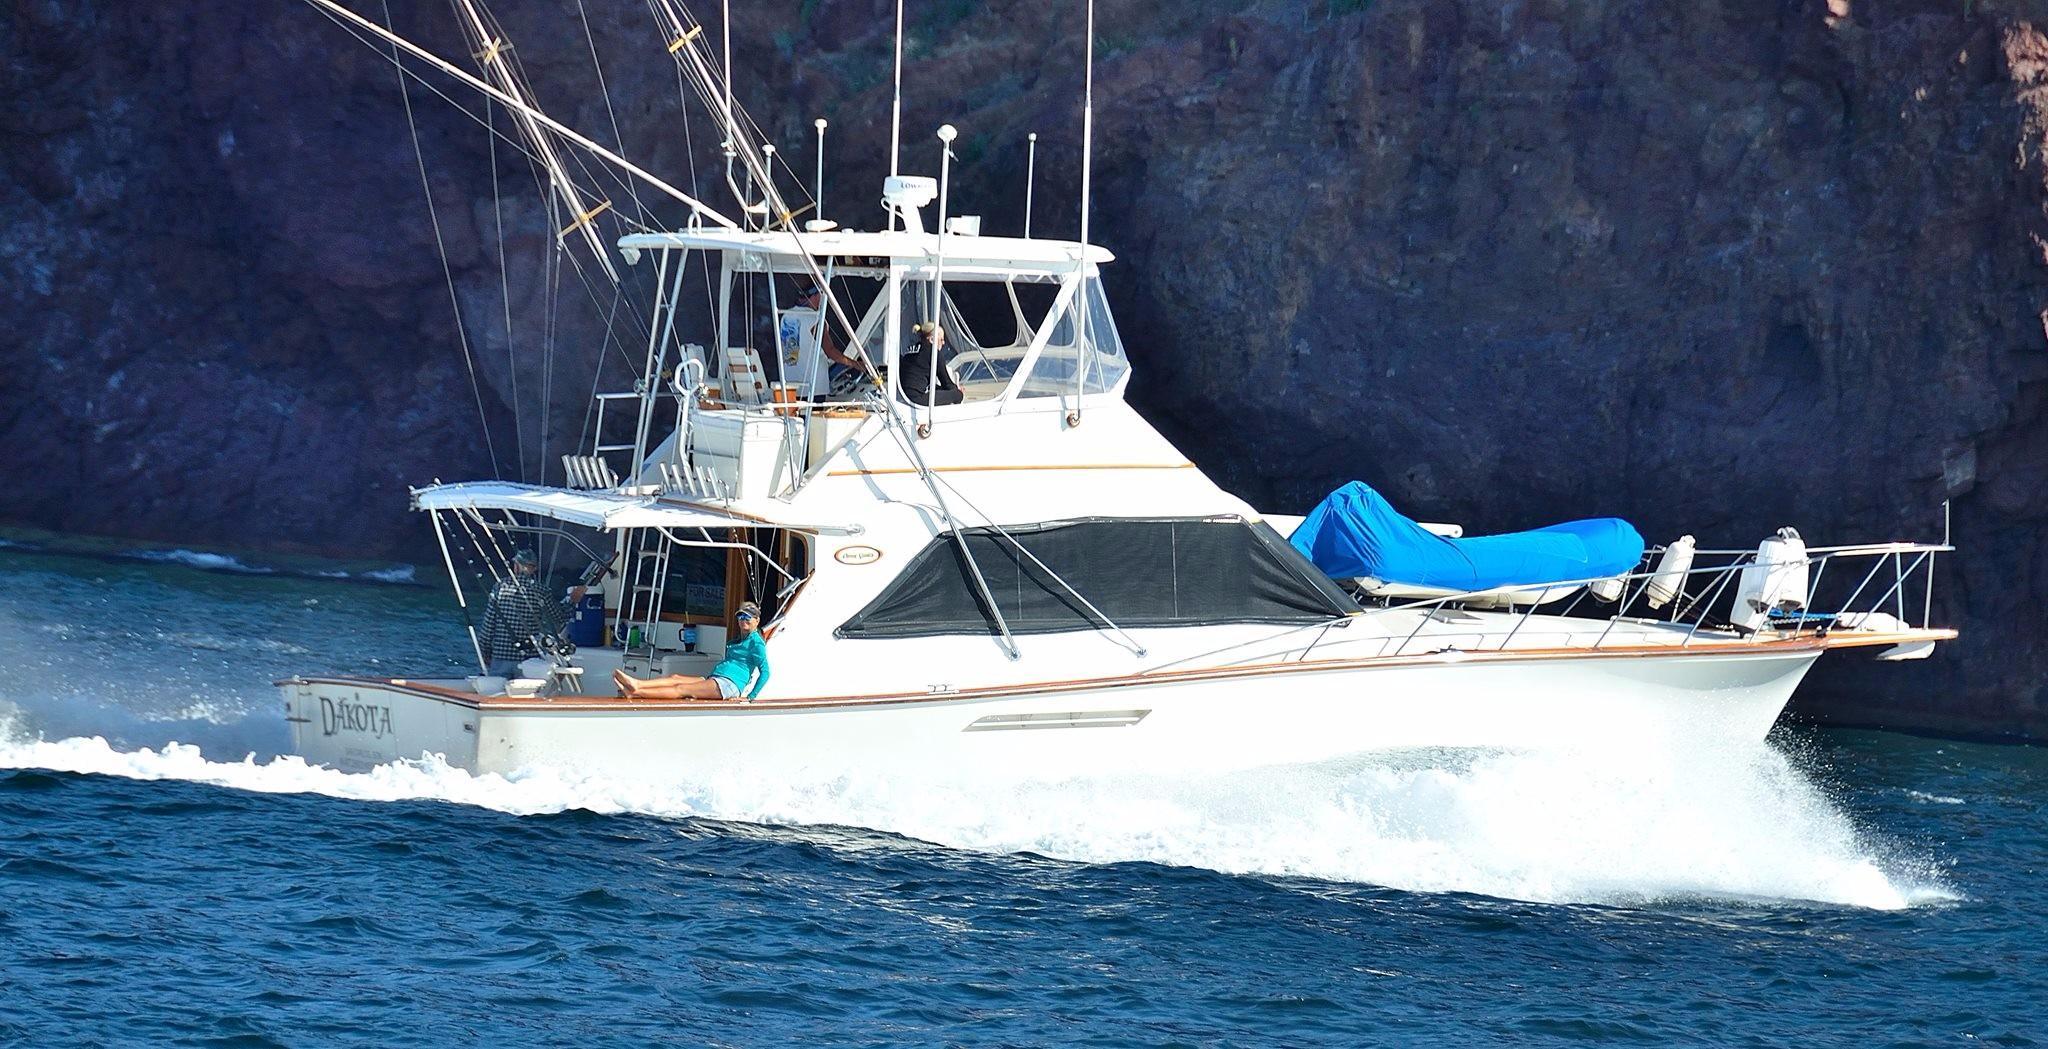 48' Ocean Yachts Super Sport+Boat for sale!